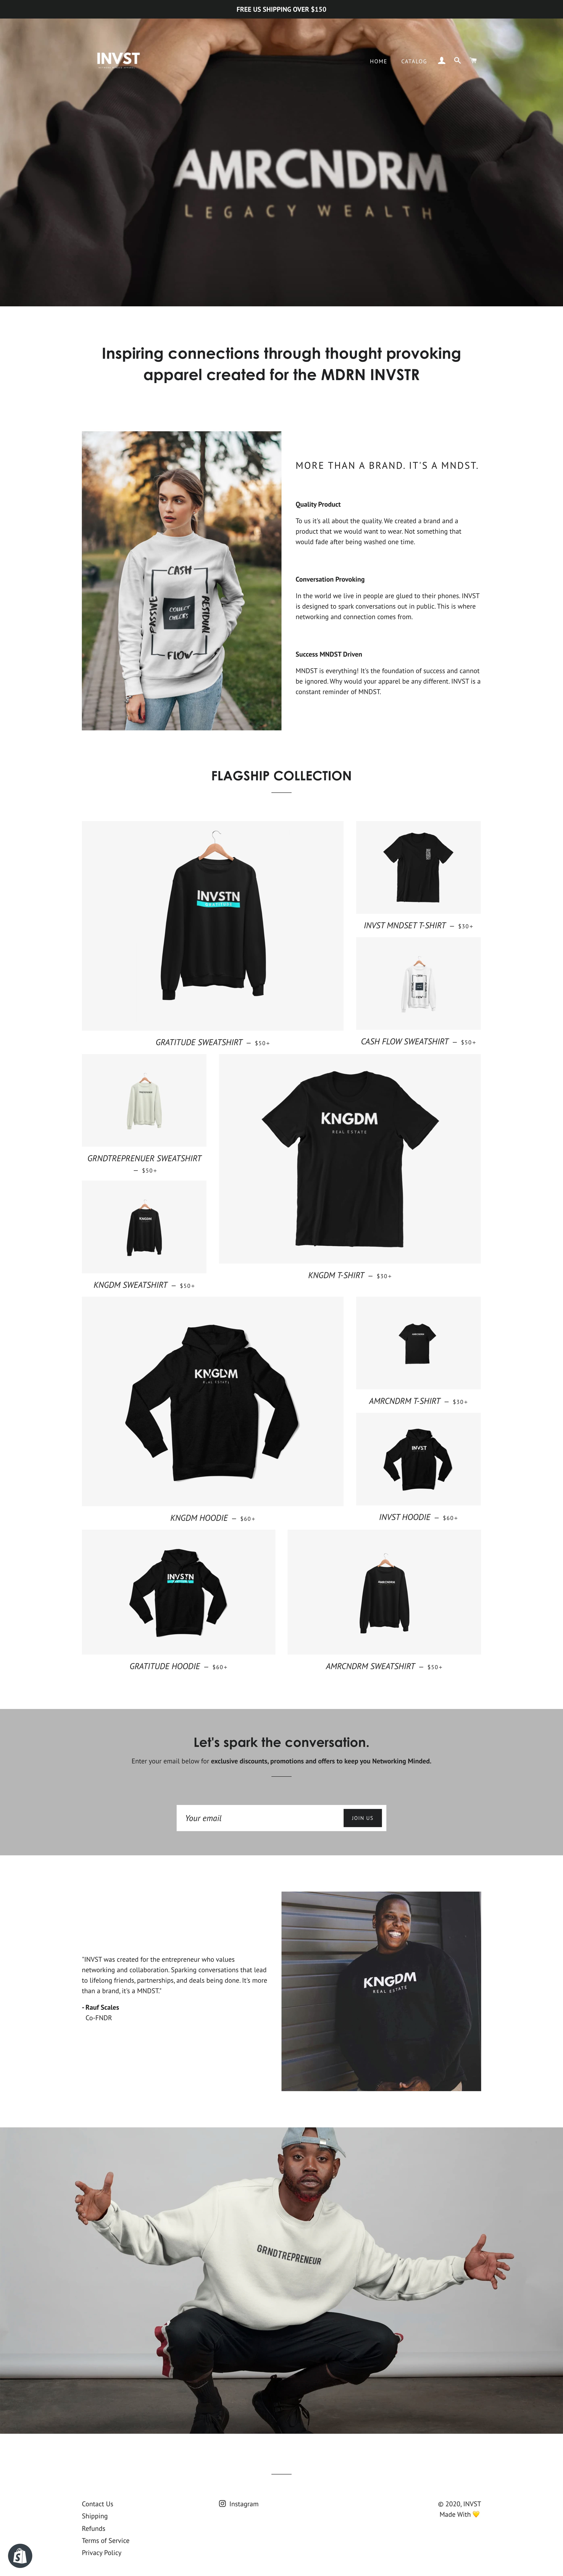 INVST Clothing Brand